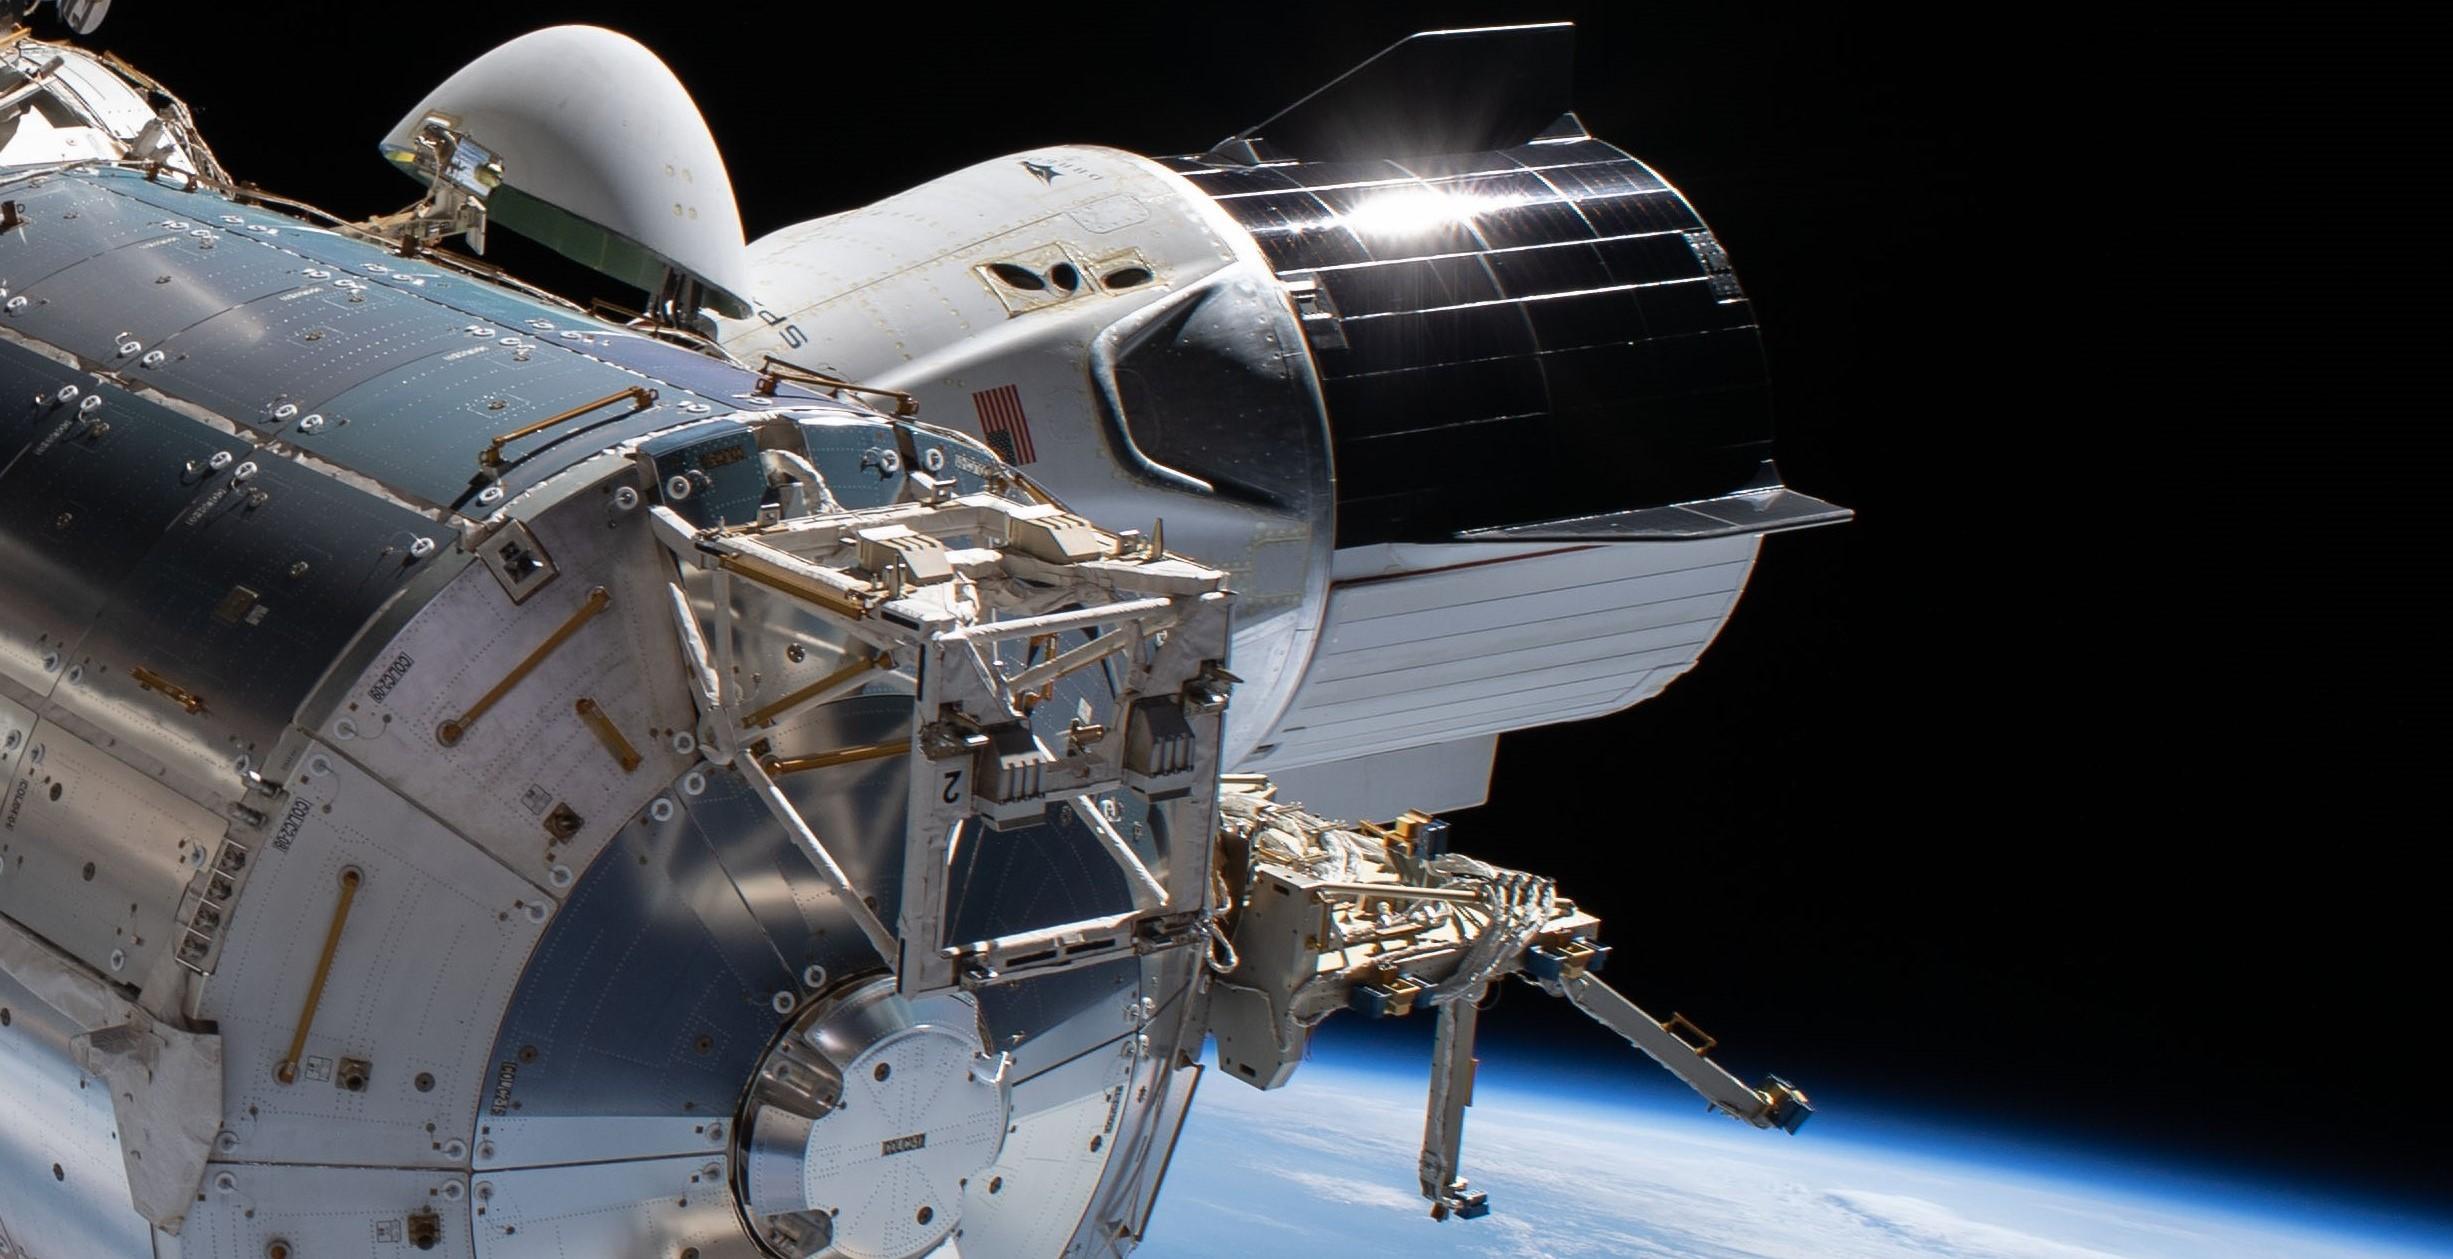 SpaceX Crew Dragon C206 Demo-2 ISS spacewalk 070120 (NASA) 2 crop 4